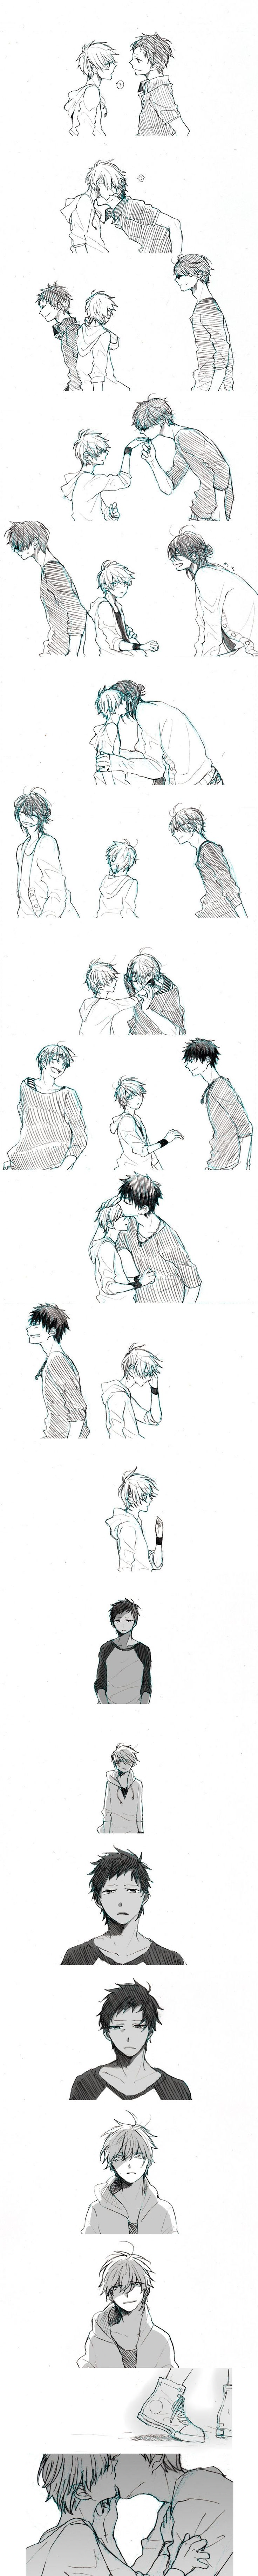 love this one so much wahh .゚☆(ノё∀ё)ノ☆゚.